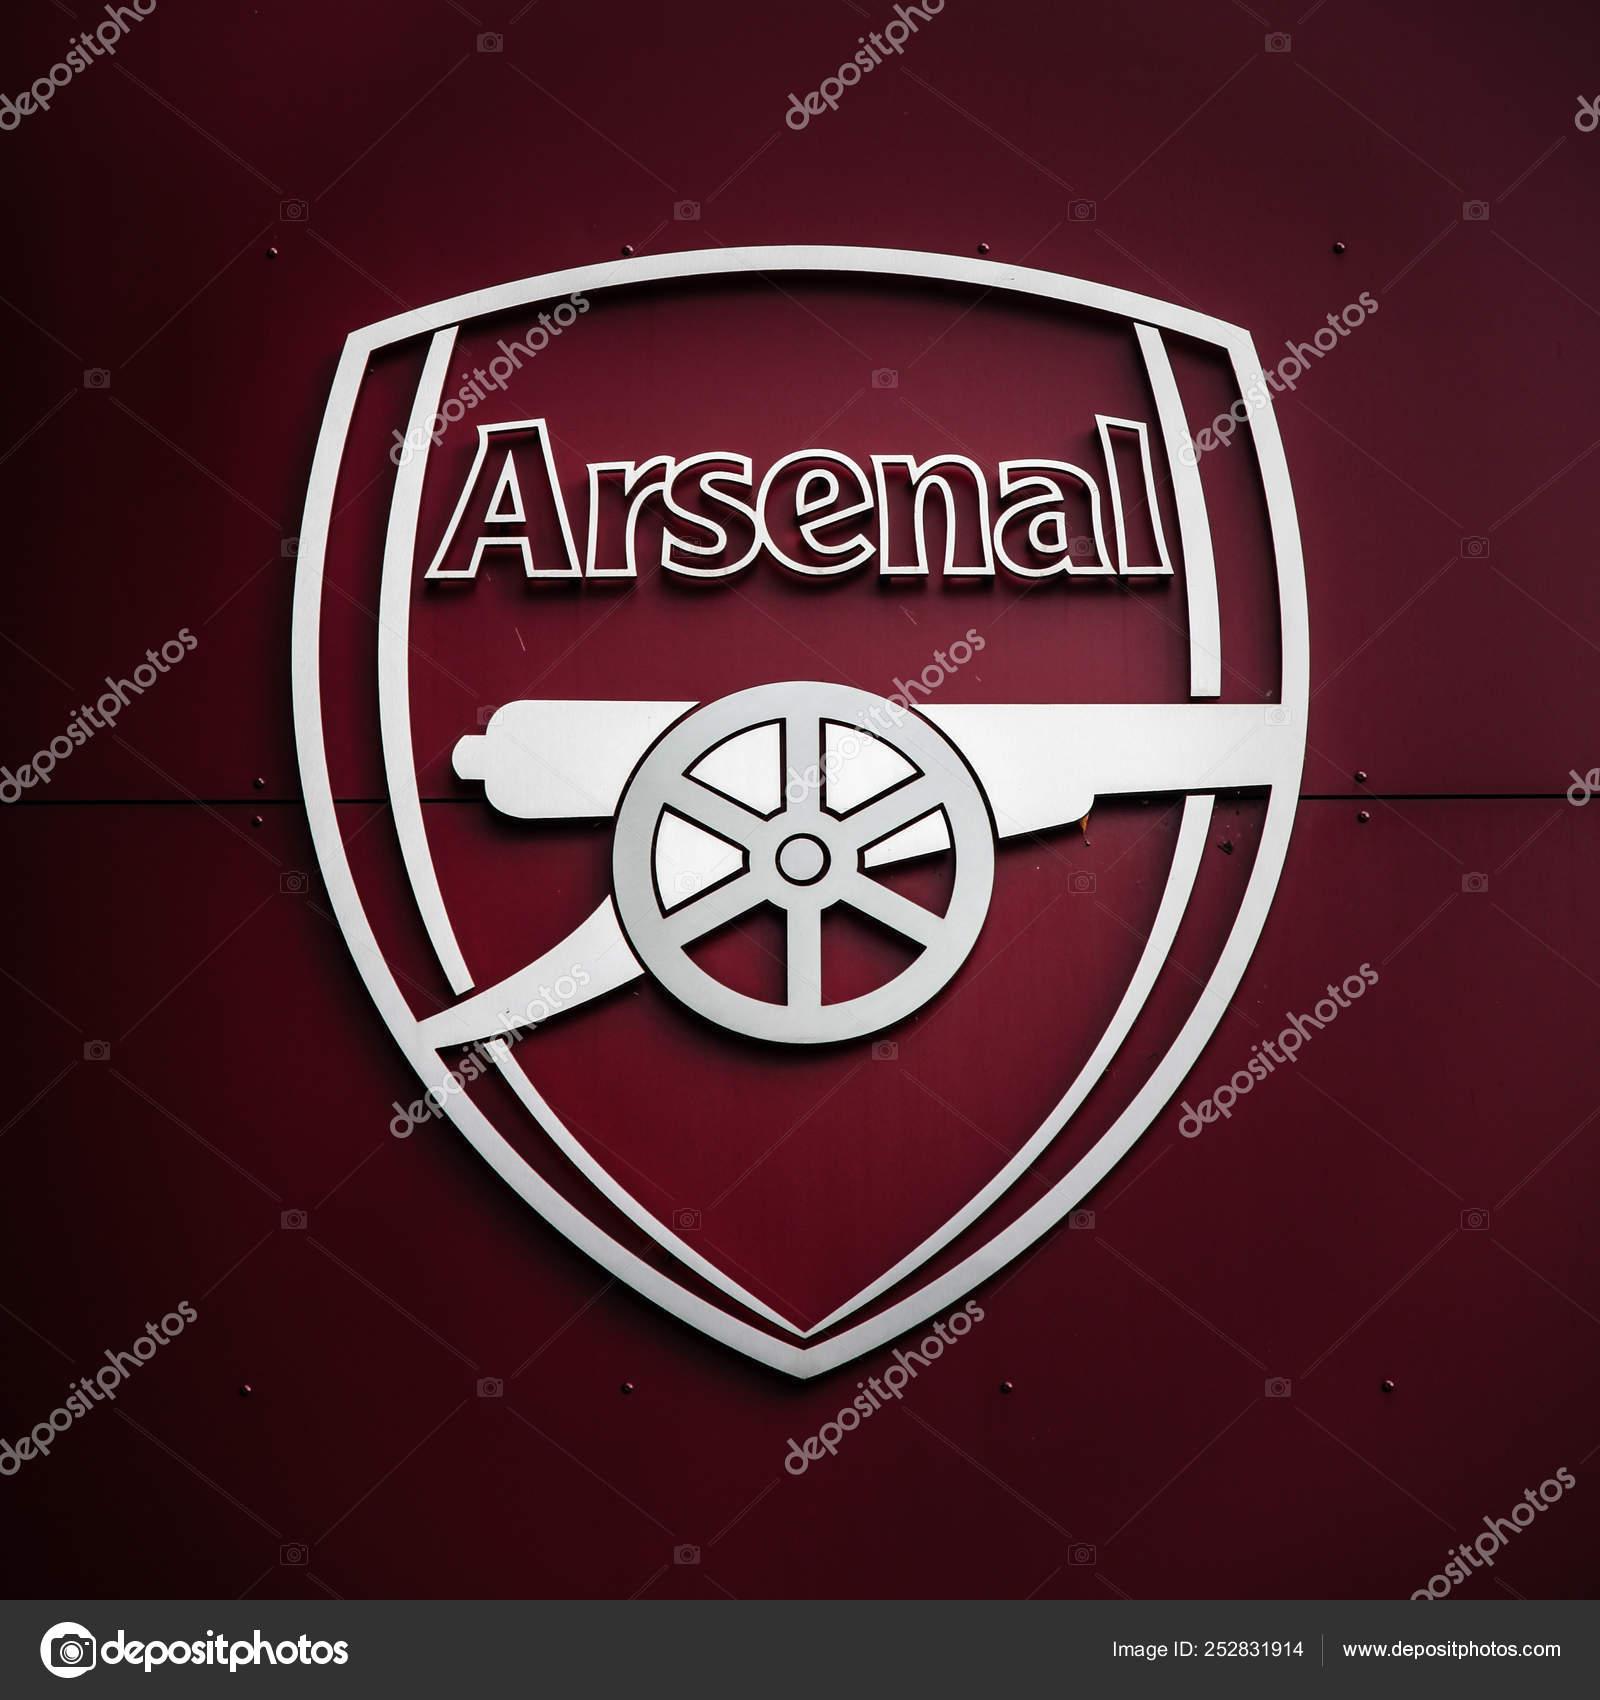 close view arsenal gunners logo stock photo image by c michael715 252831914